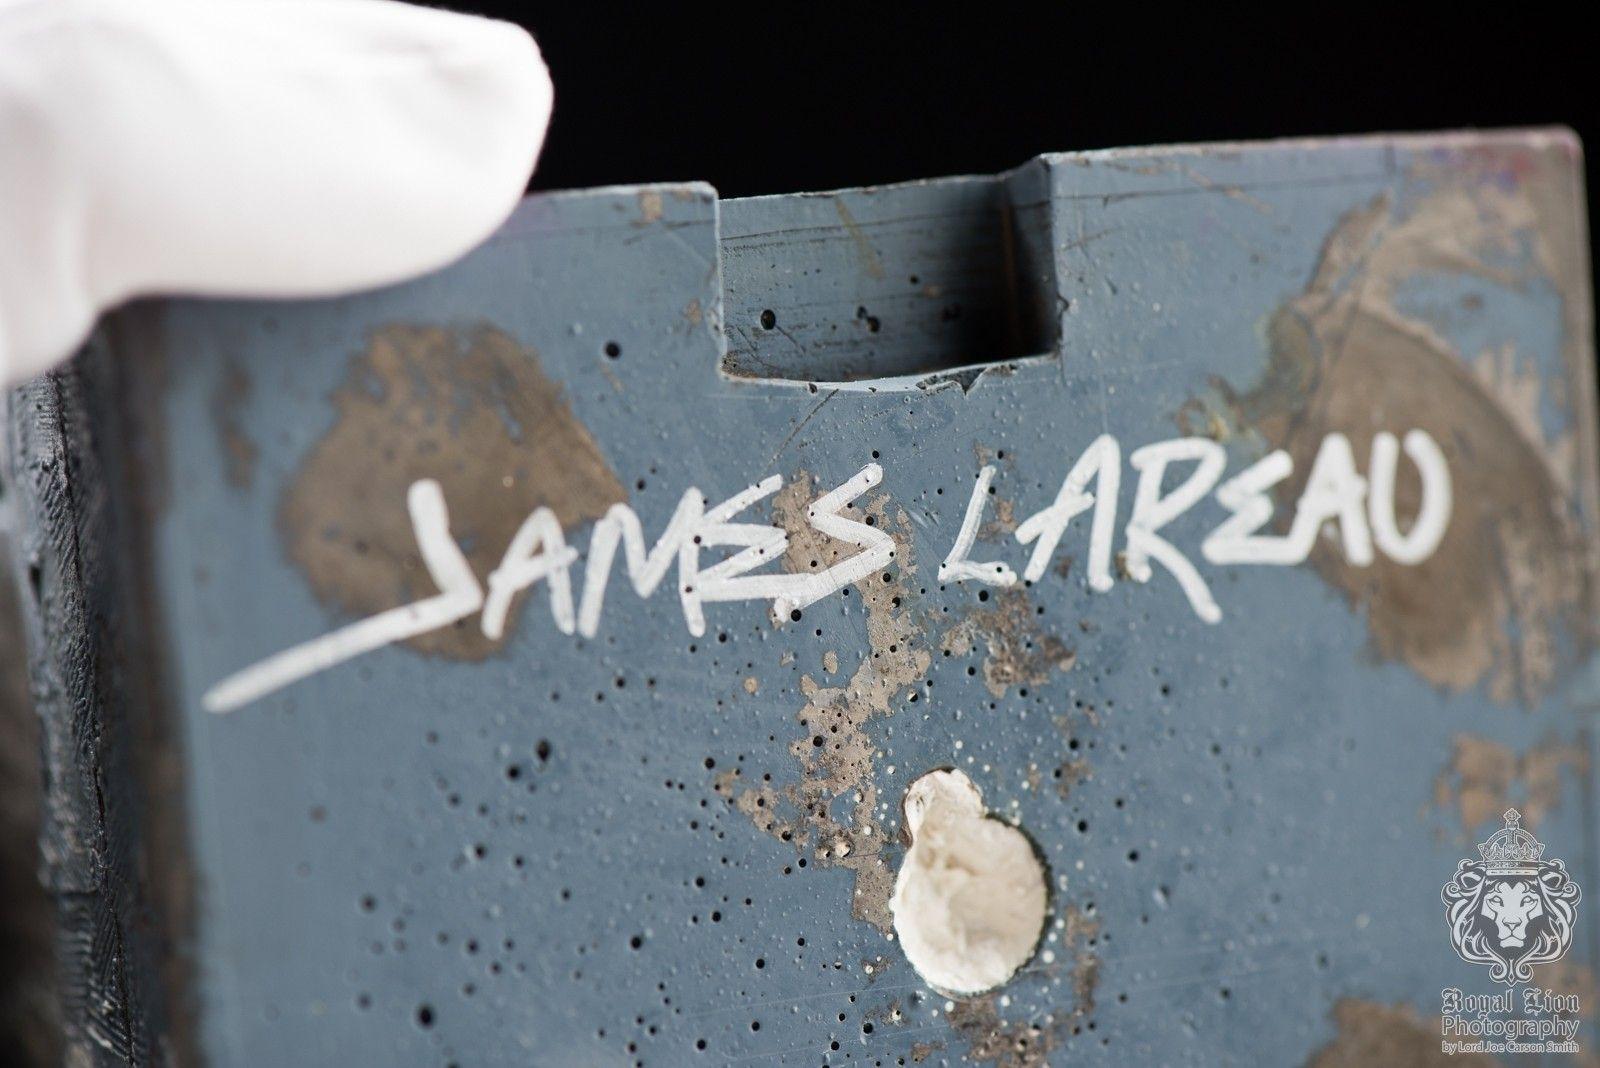 Oakley Bunker Tower Trophy Original Positive Signed by James Lareau - Another Major Price Drop - ND8_3462.jpg